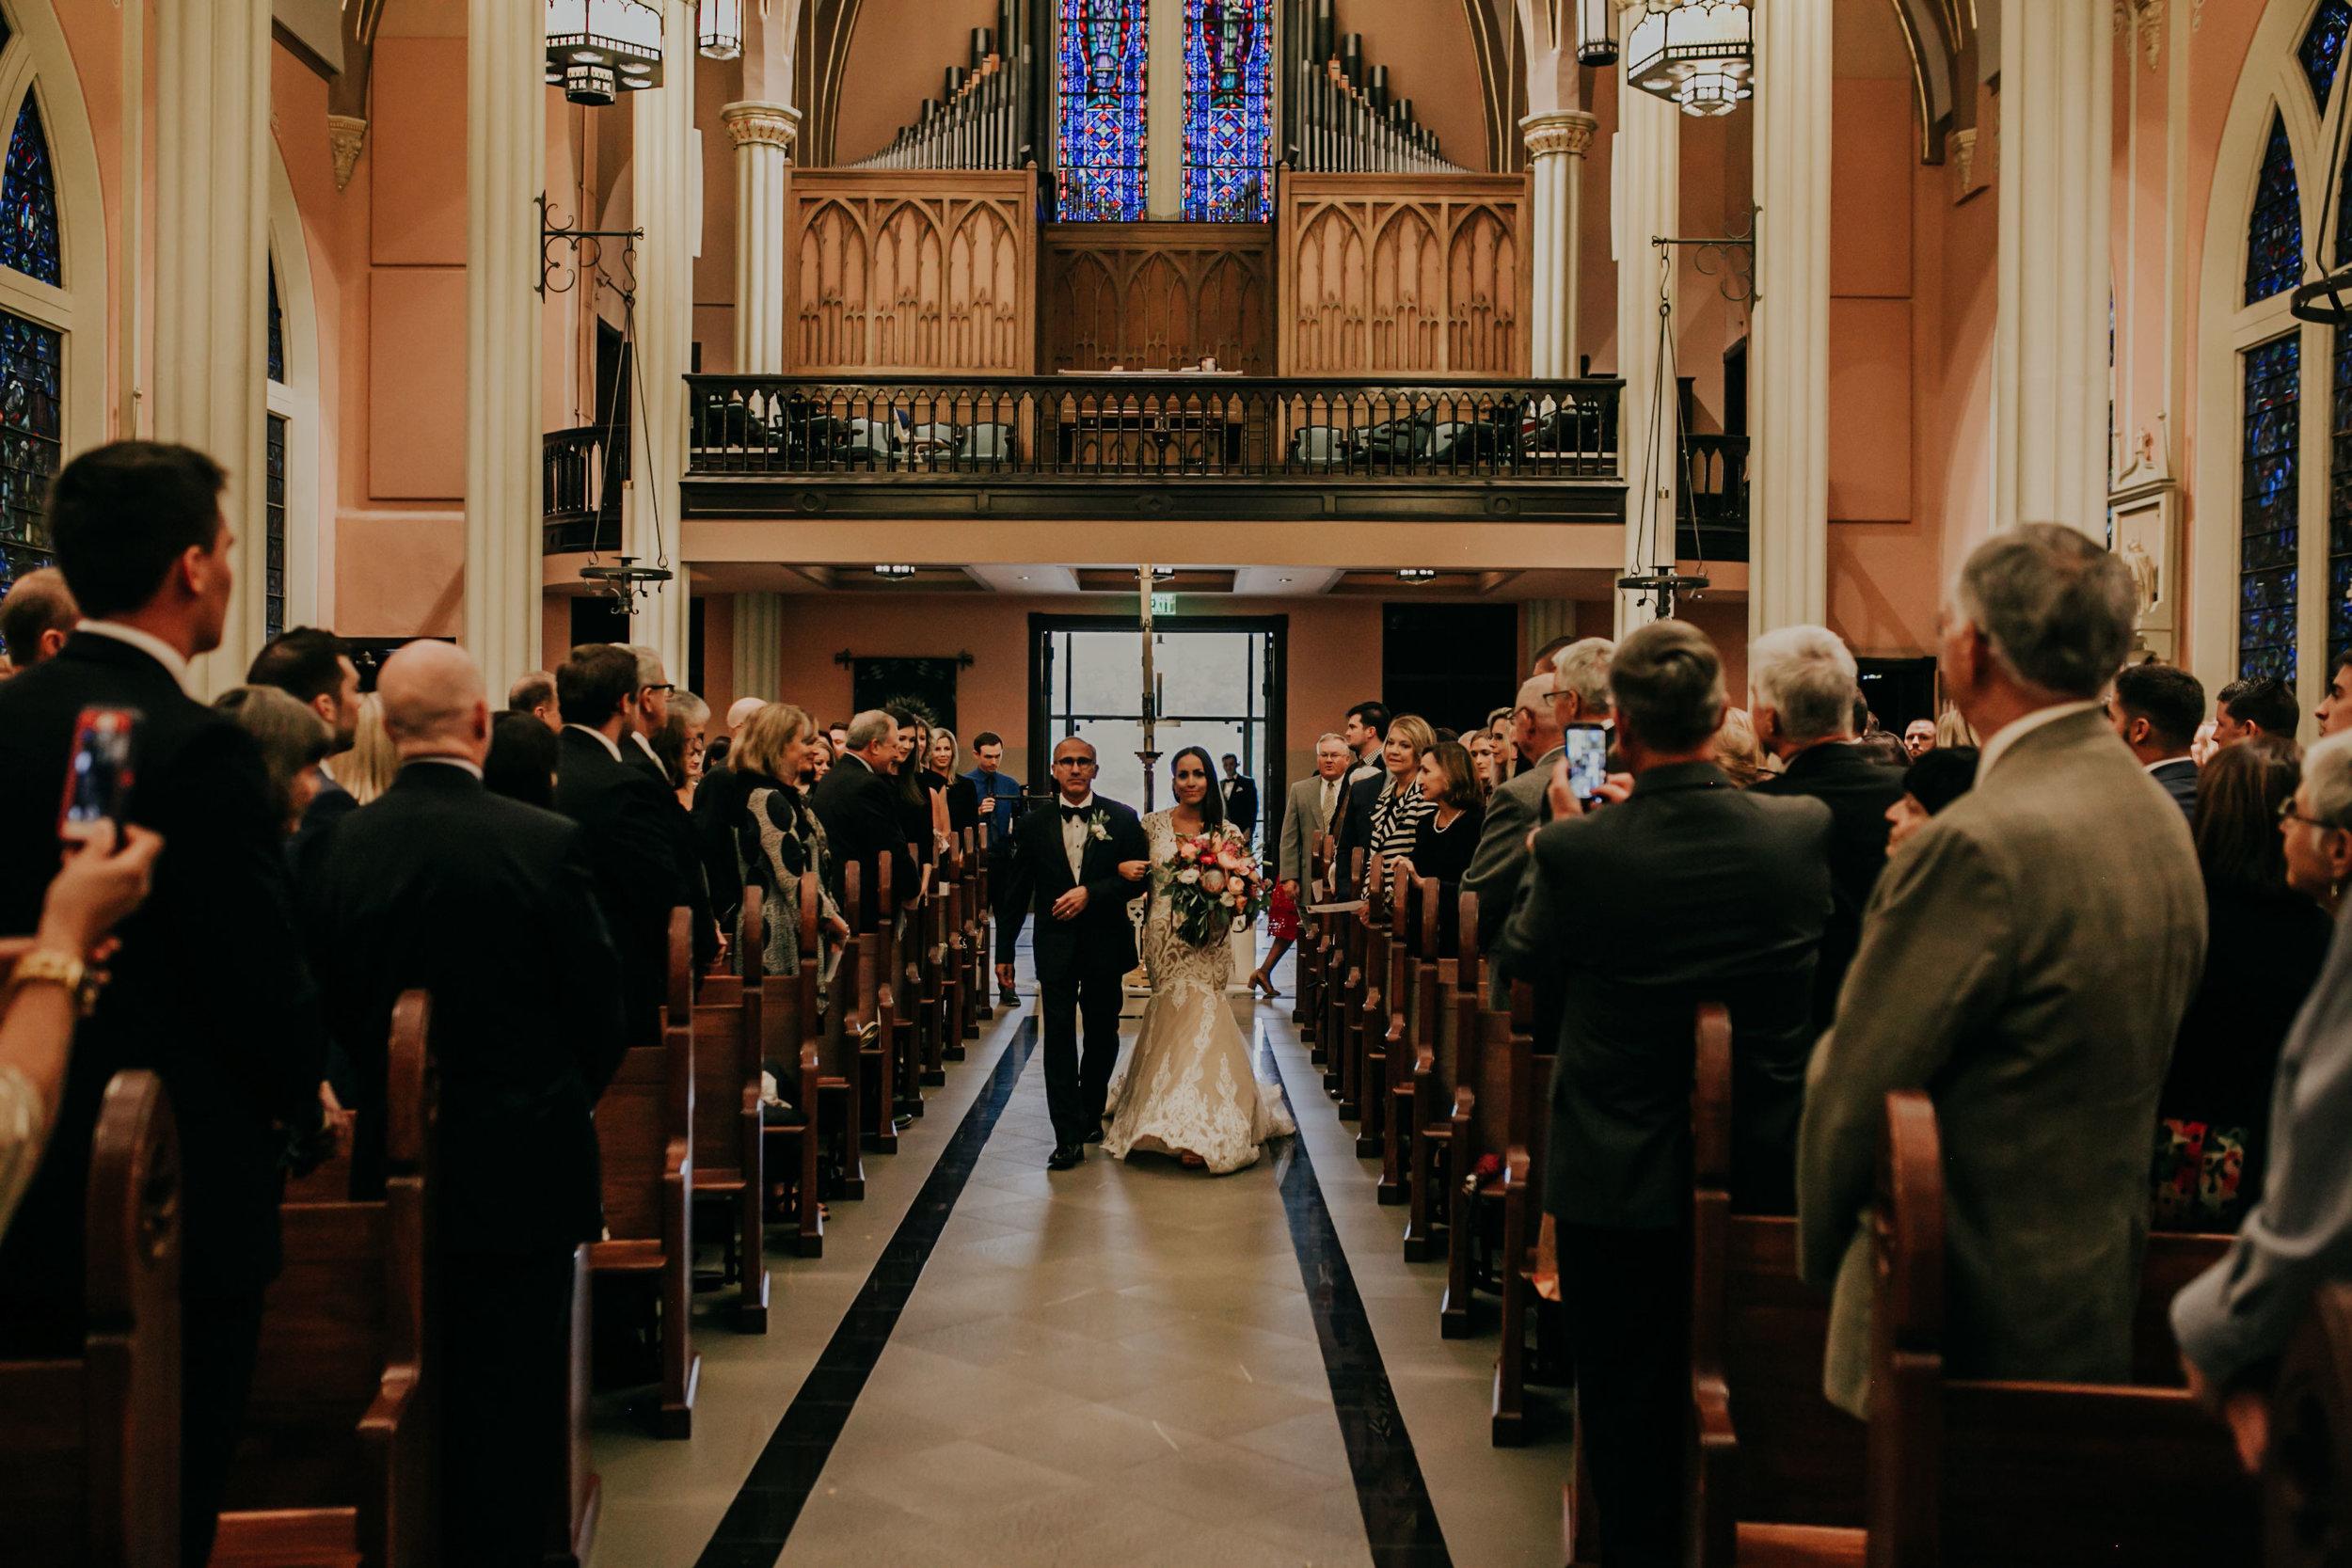 bride-walking-down-aisle-with-father-st-johns-church-at-creighton-omaha-nebraska-raelyn-ramey-photography.jpg